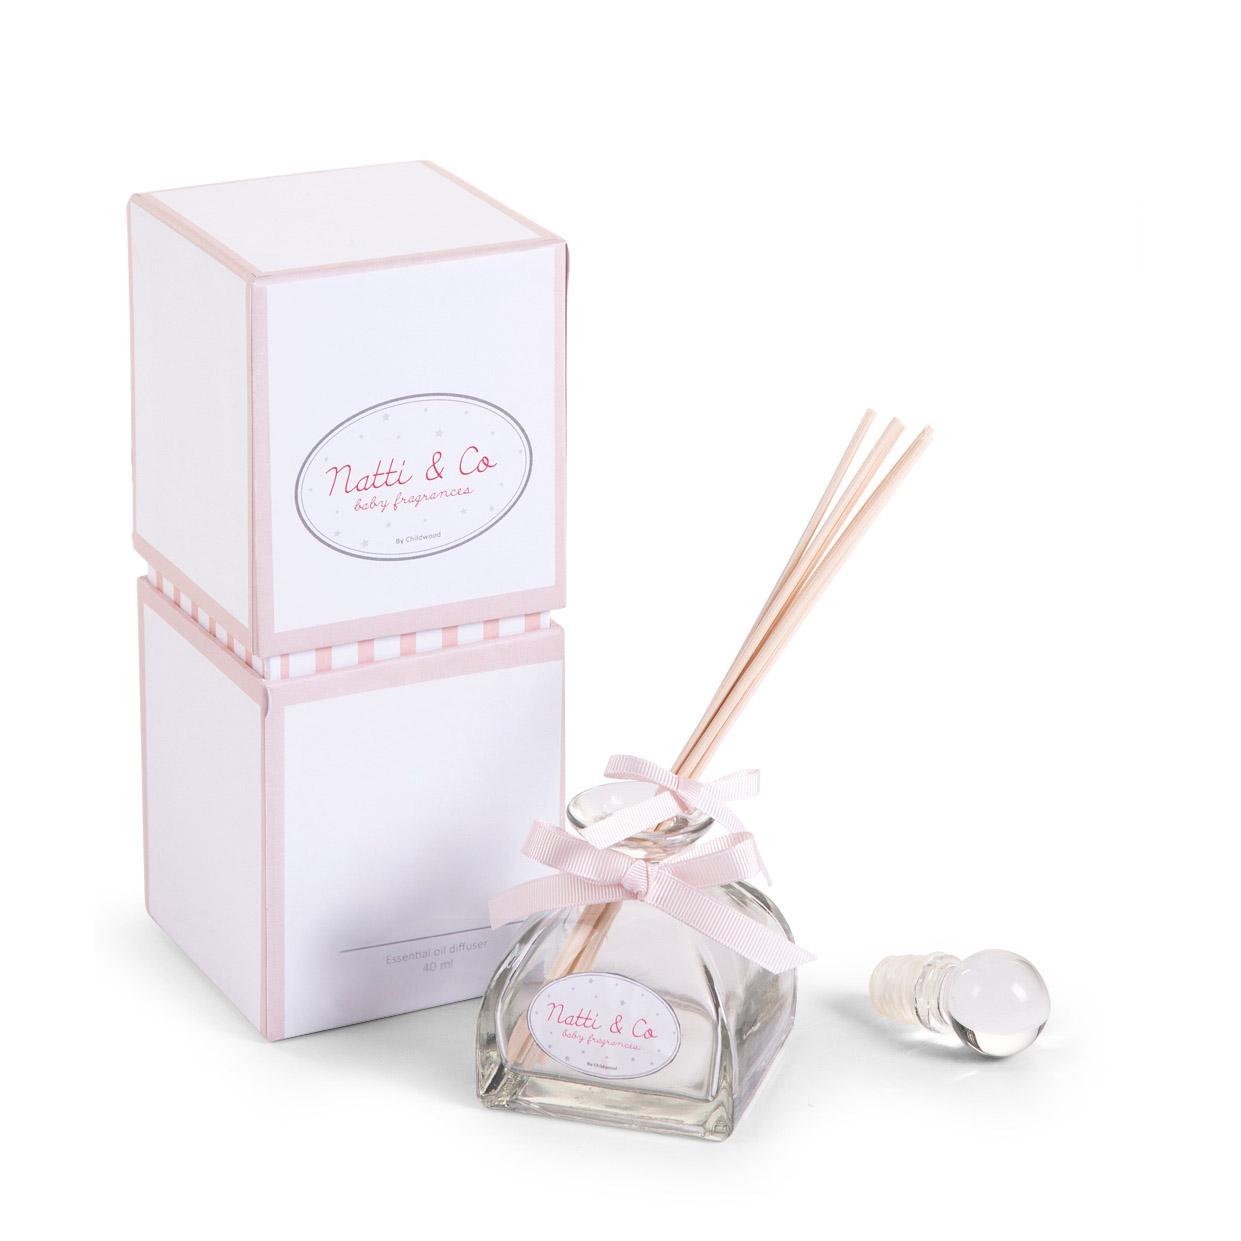 Difuzor ulei parfumat NATTI & CO roz 175 ml imagine